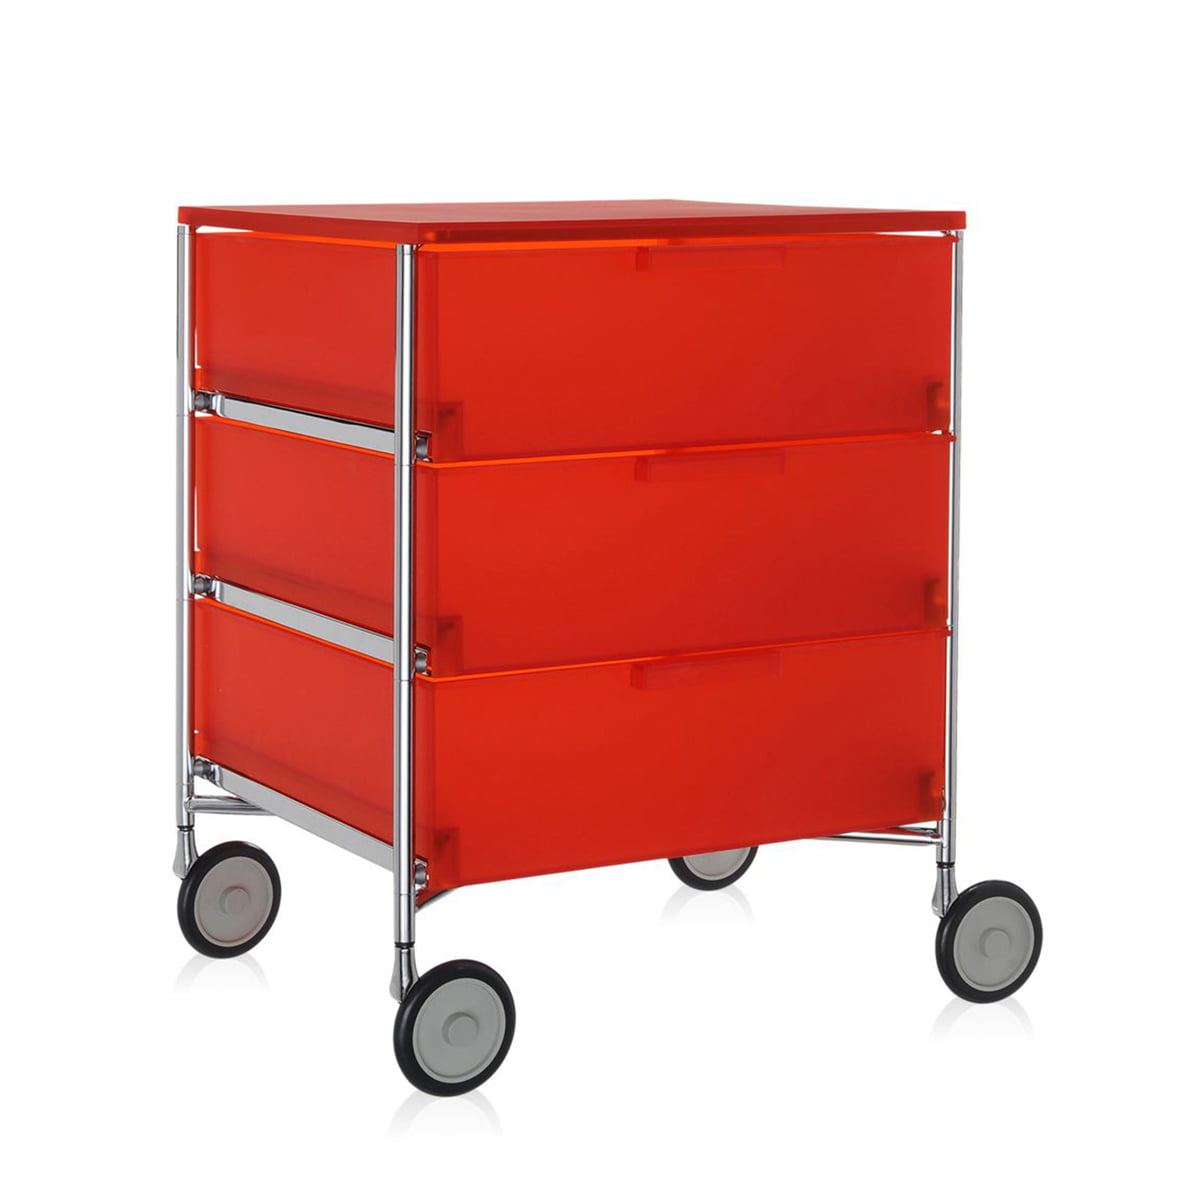 Kartell - Mobil Container - mit Rollen, 3 Schubladen, dunkelorange | Büro > Büroschränke | Orange | Verchromtes stahlrohr -  pmma | Kartell